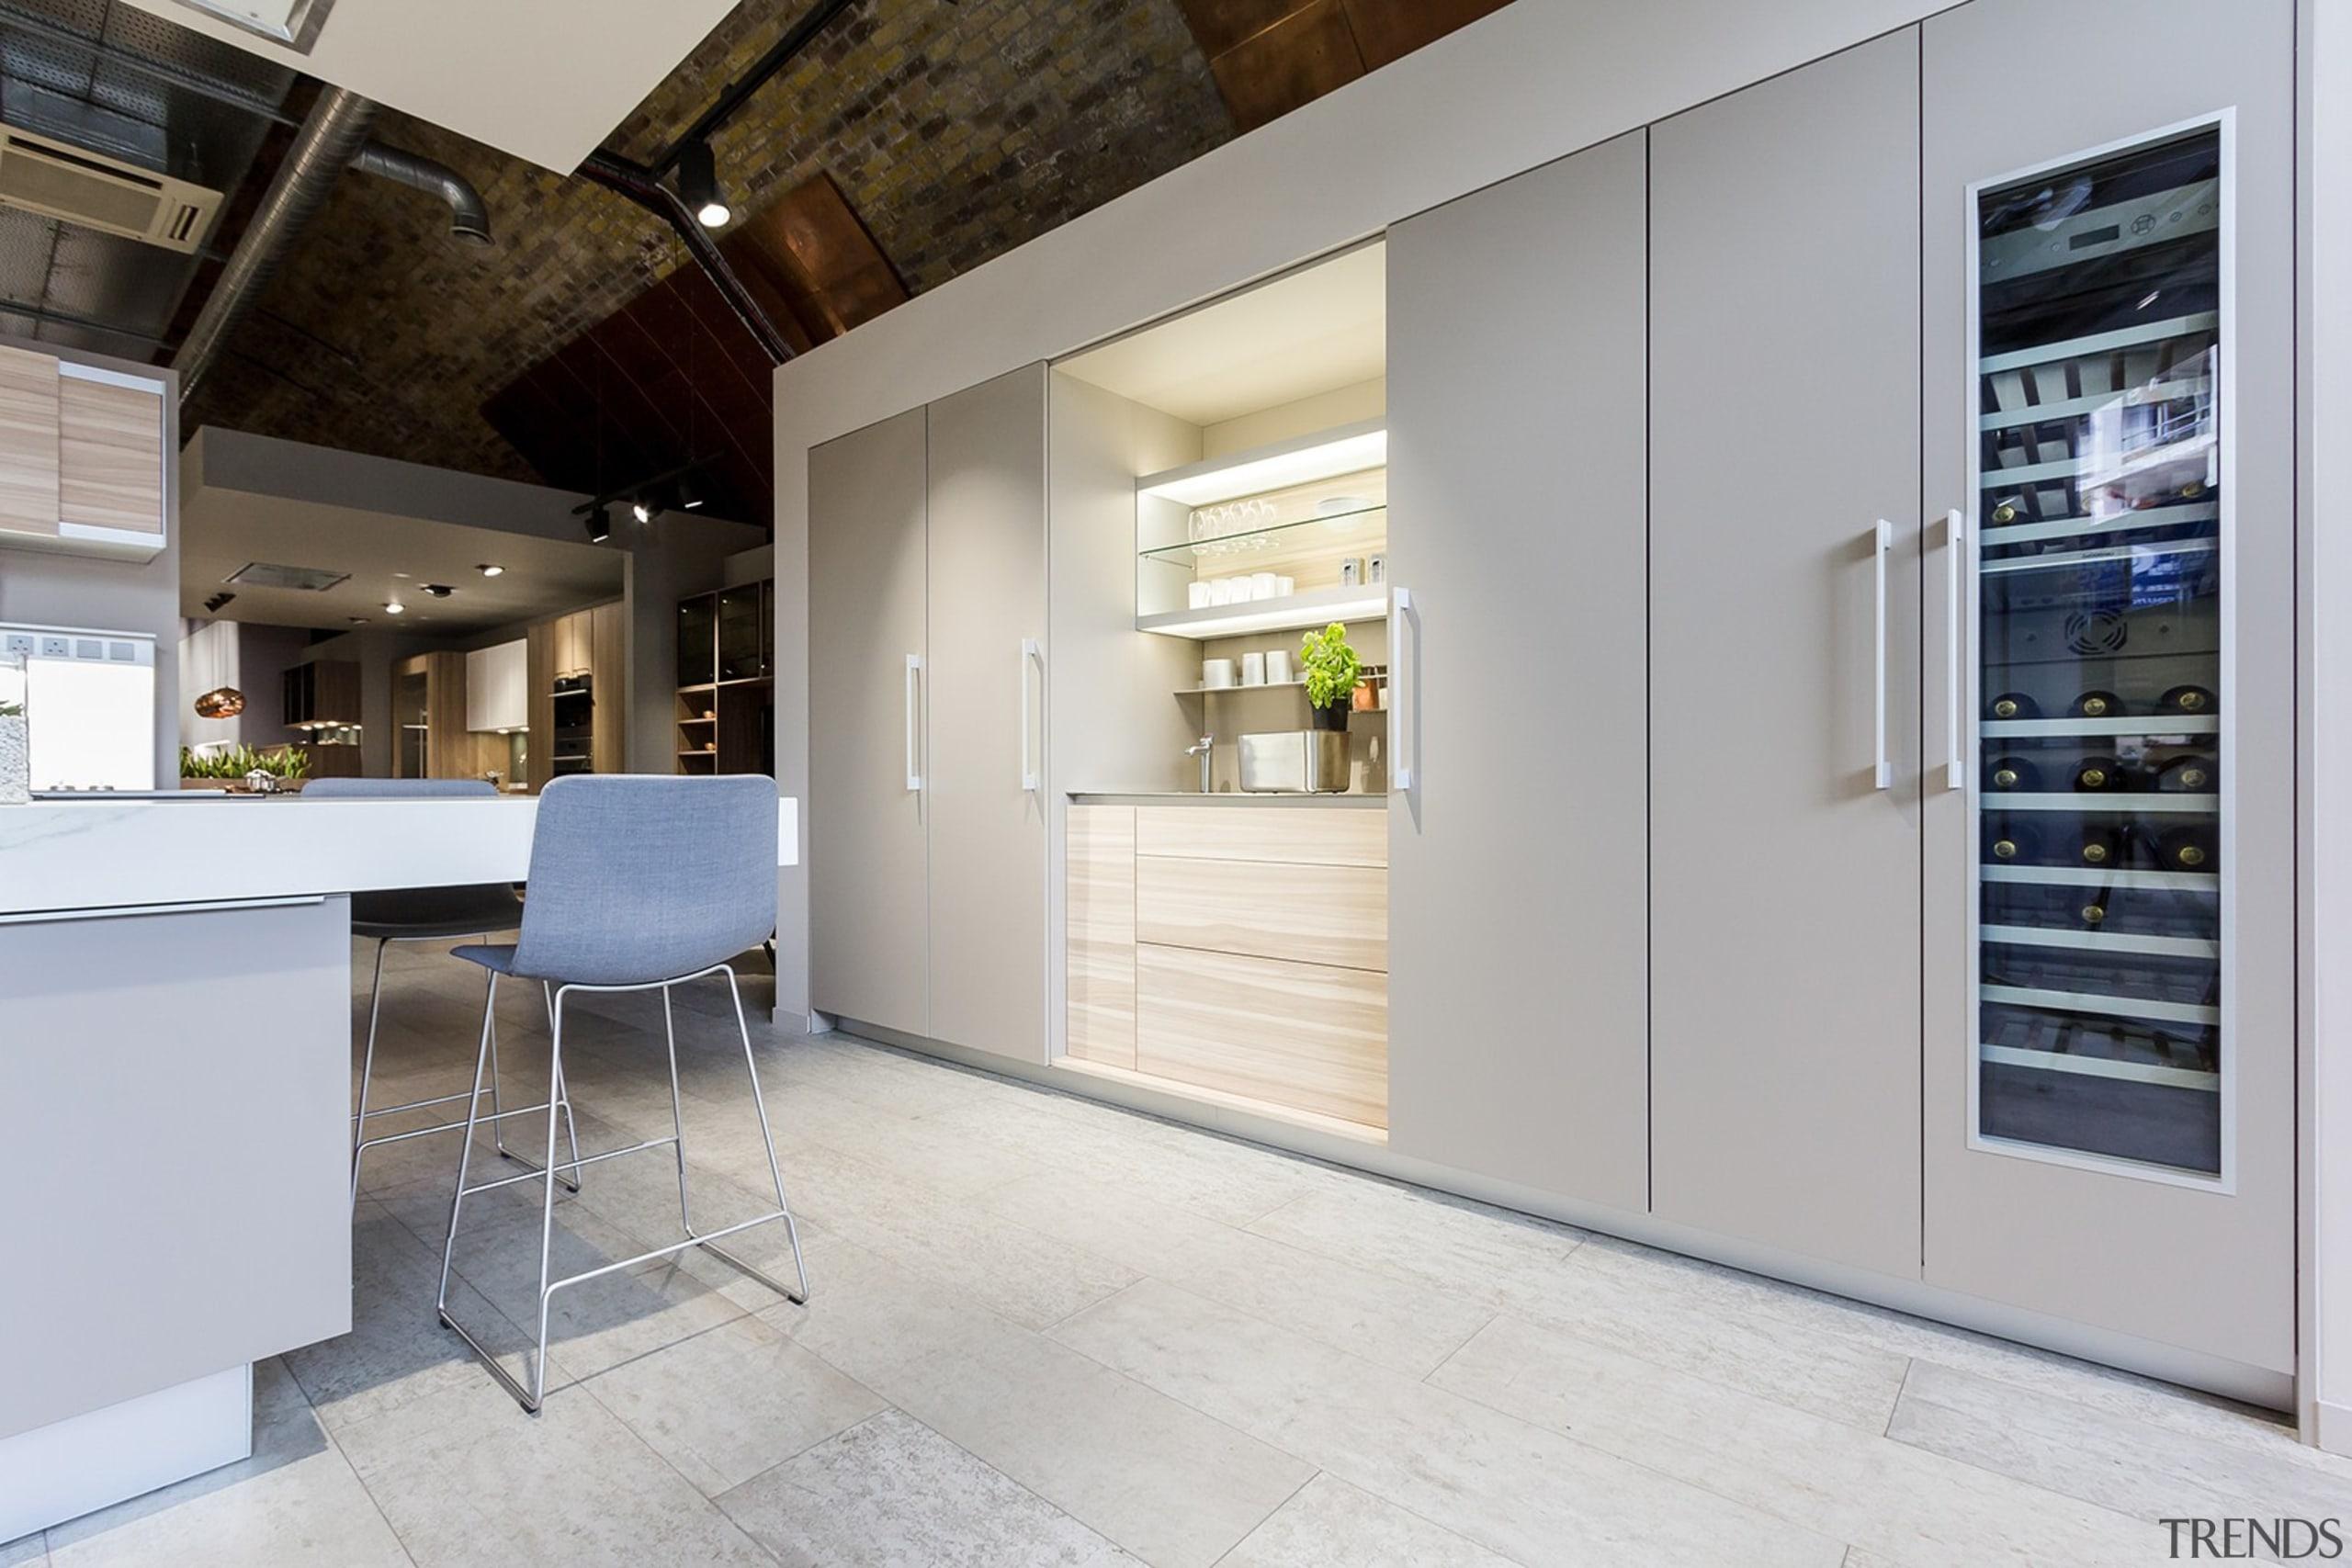 Concreate CF101 PoggenPohl 4 - Concreate_CF101_PoggenPohl_4 - floor floor, flooring, interior design, kitchen, real estate, gray